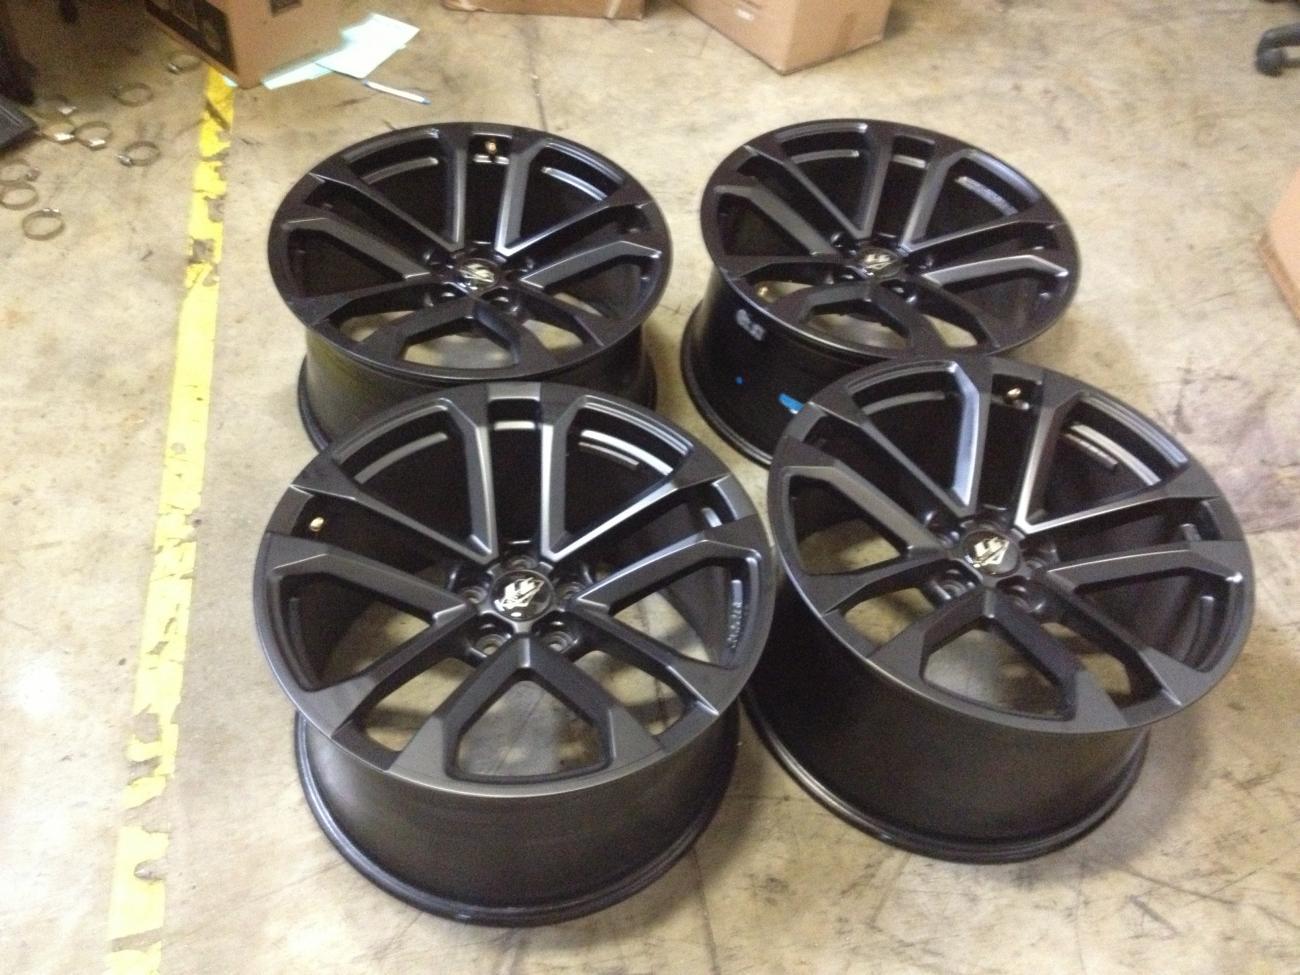 Zl1 Replica Wheels For Sale Camaro5 Chevy Camaro Forum